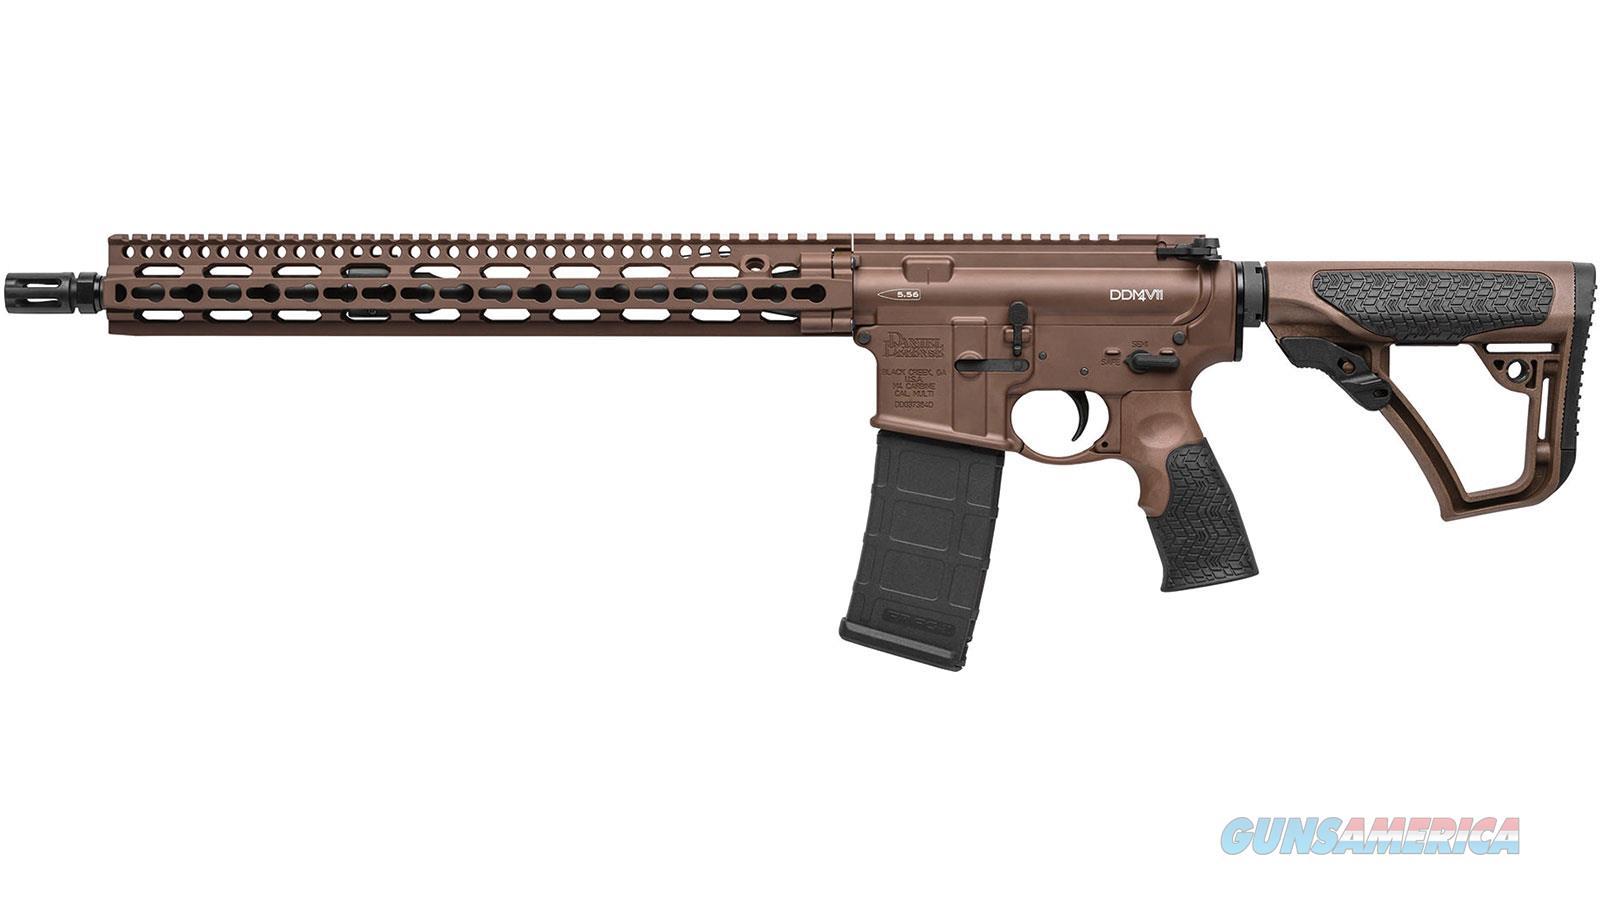 "Daniel Defense Ddm4v11 Slw 5.56 14.5"" 02-151-08188-047  Guns > Rifles > D Misc Rifles"